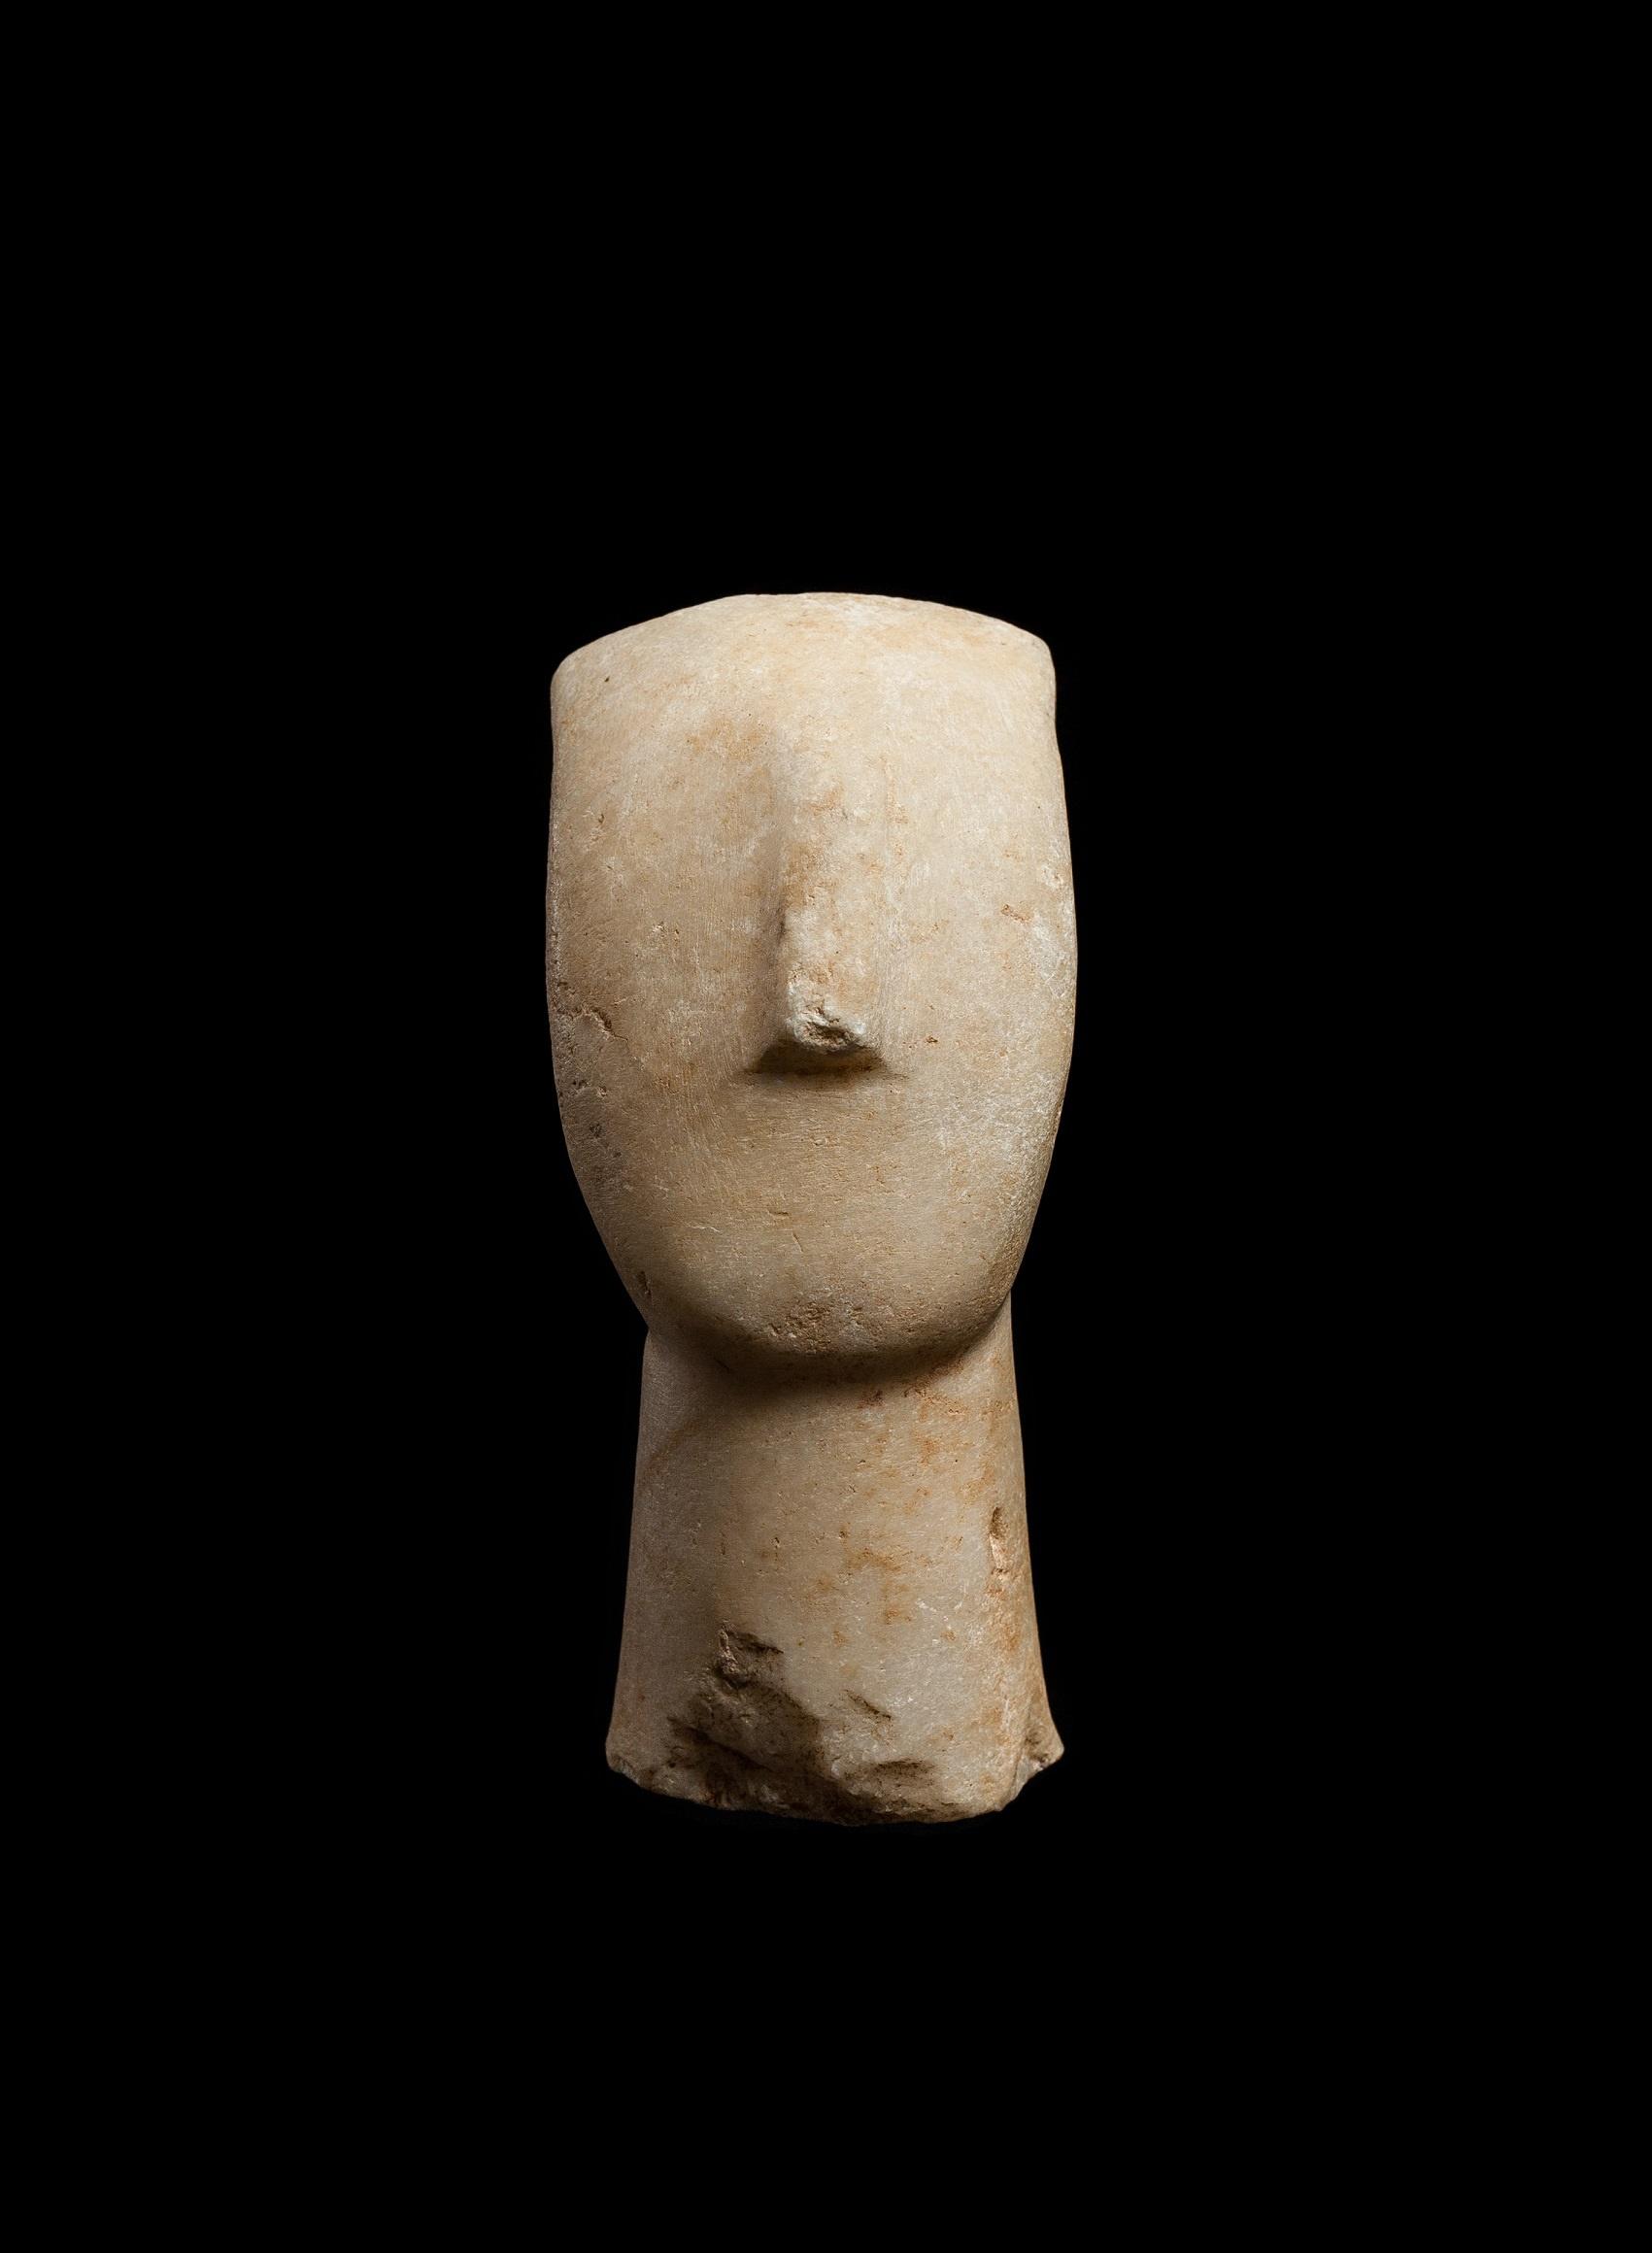 CYCLADIC IDOL HEAD CYCLADES, EARLY CYCLADIC II, C. 2600 - 2400 B.C.